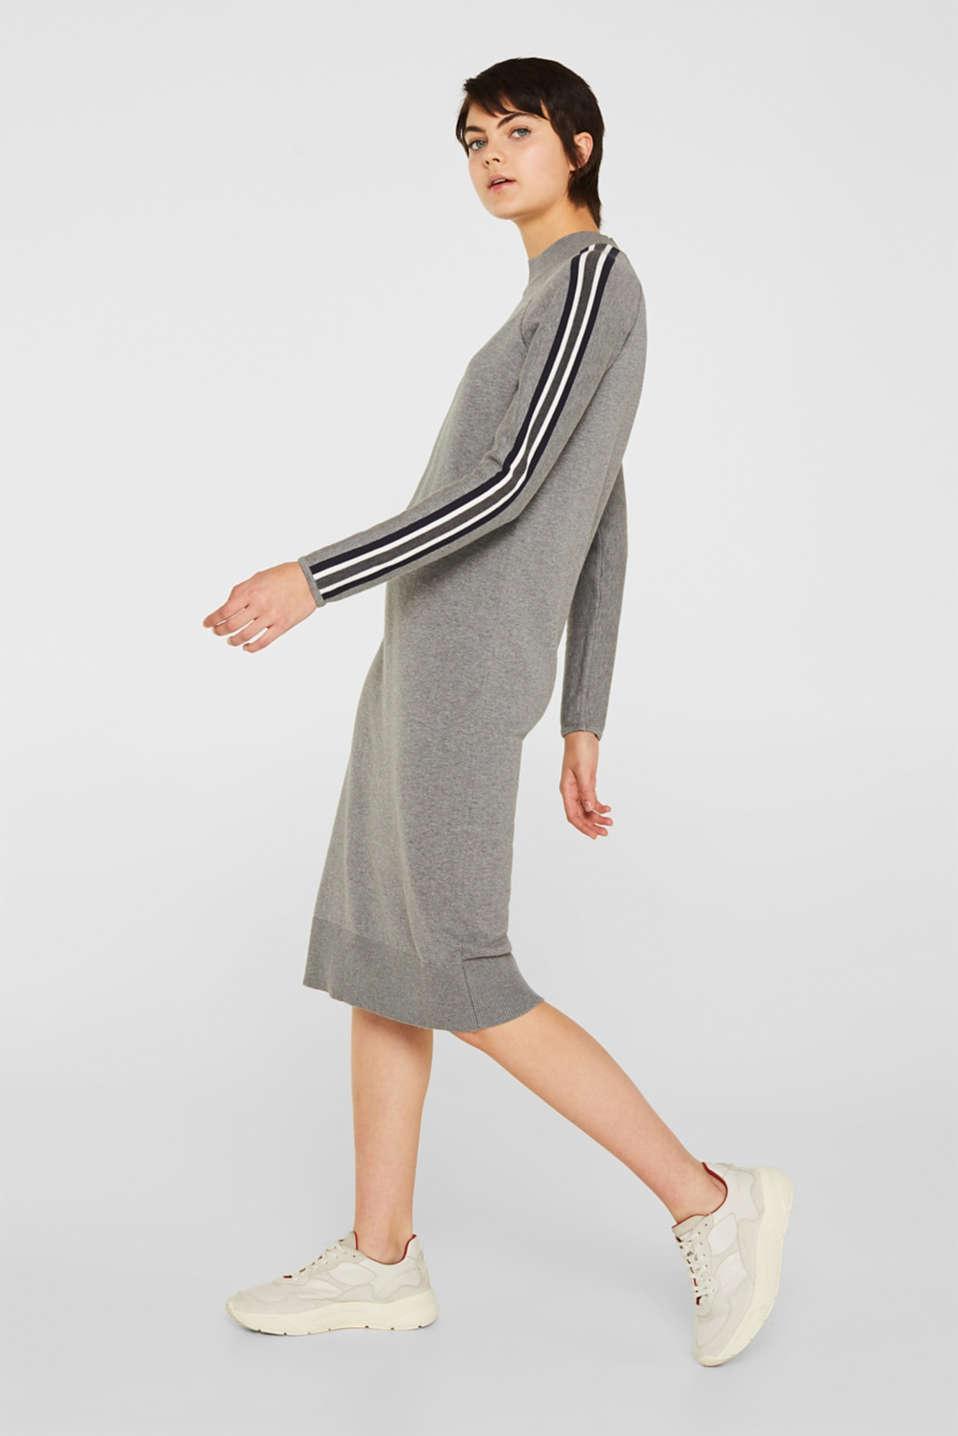 Dresses flat knitted, GUNMETAL 5, detail image number 1